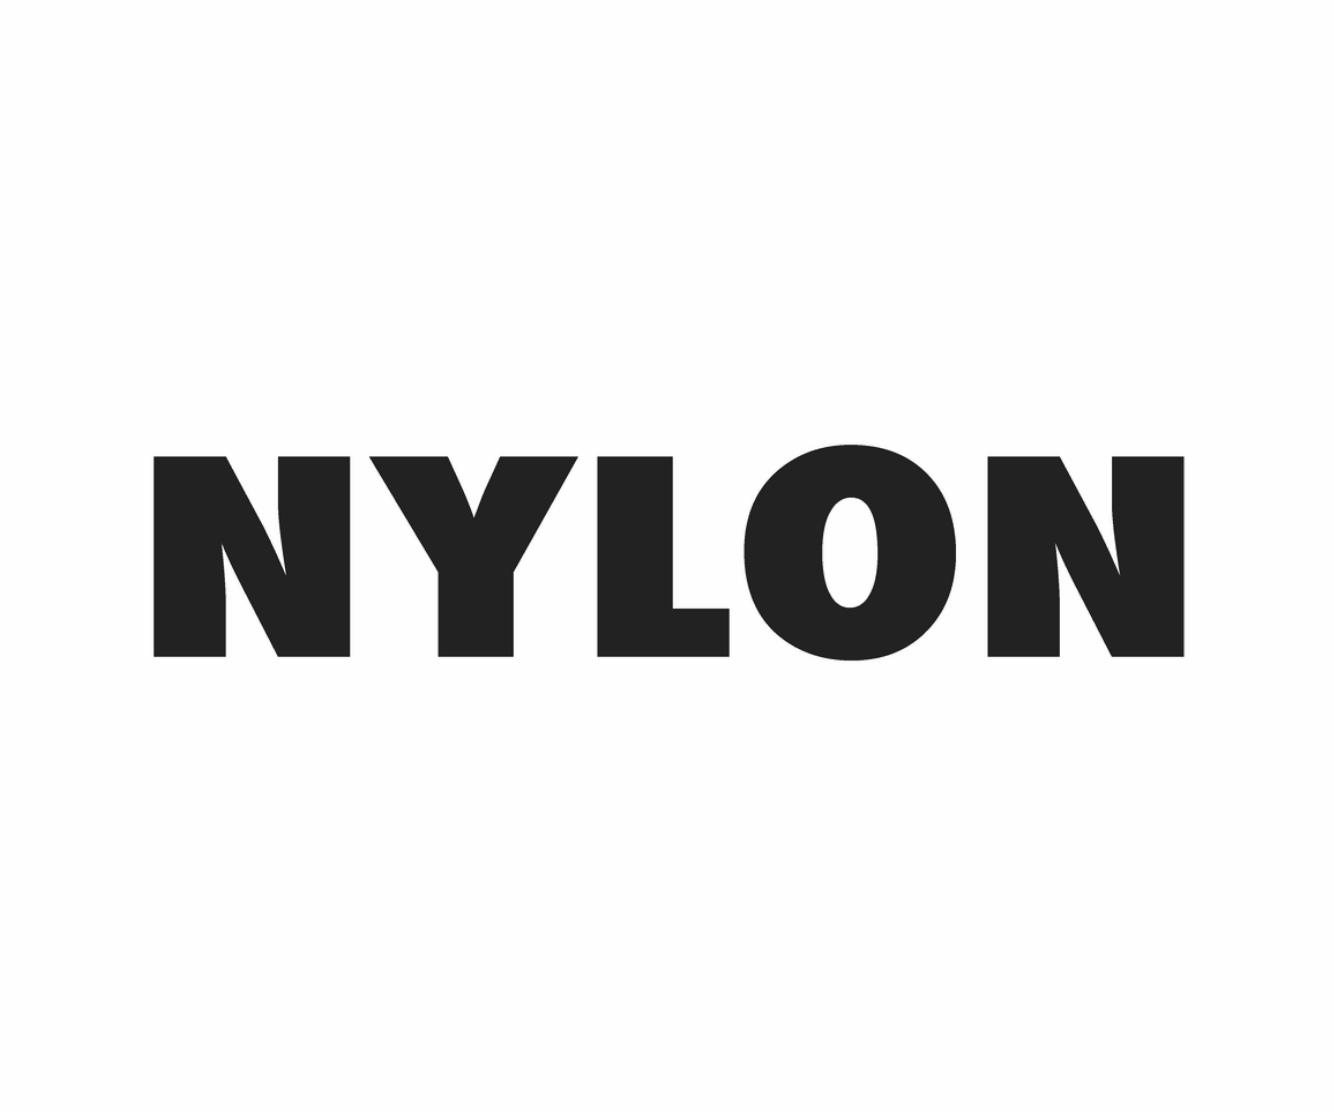 at-nylonpinklogo.png